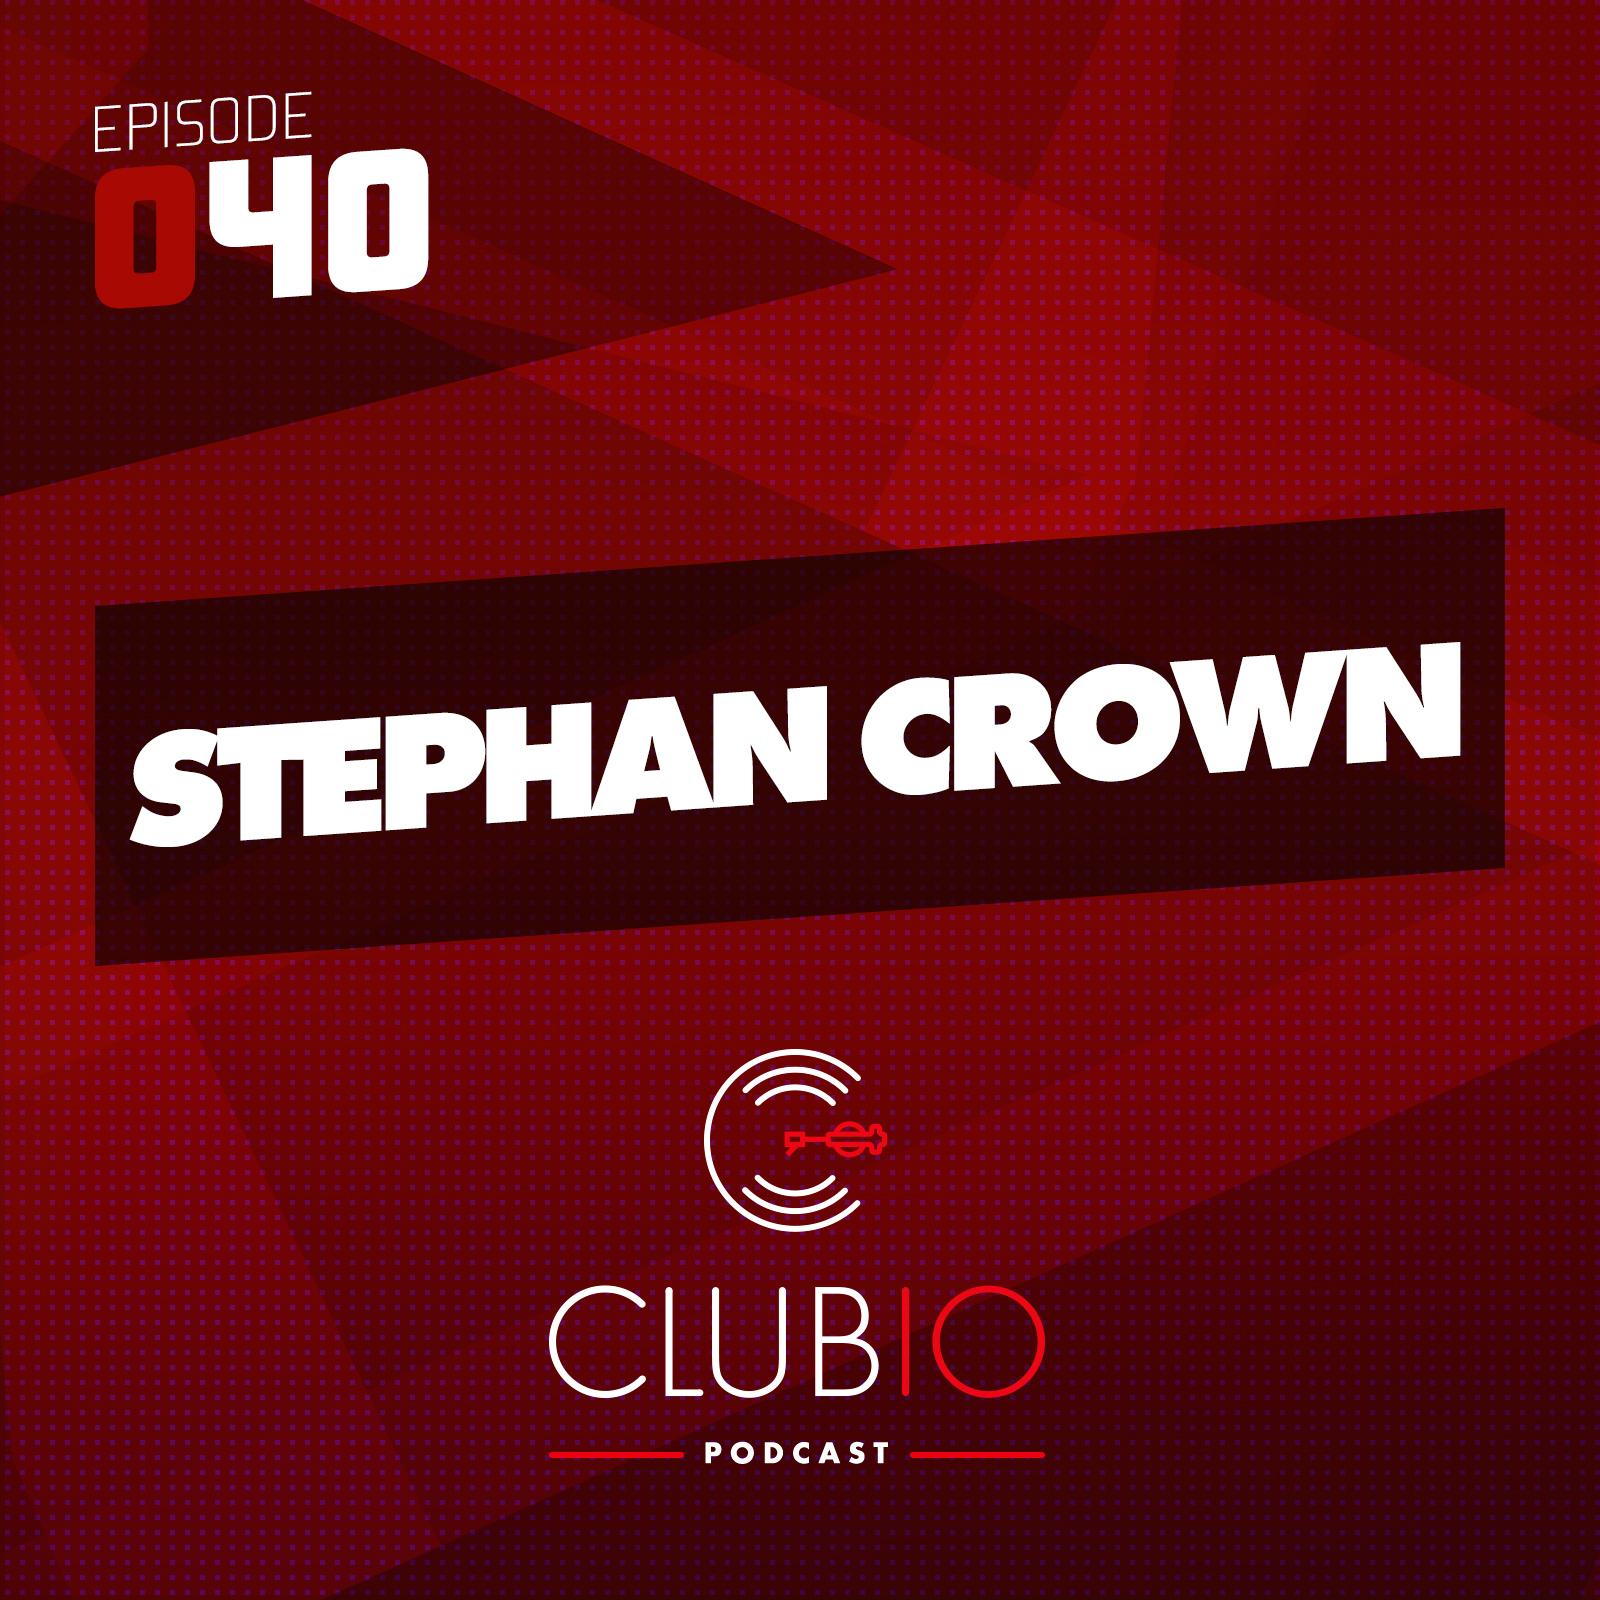 Clubio Podcast 040 - Stephan Crown